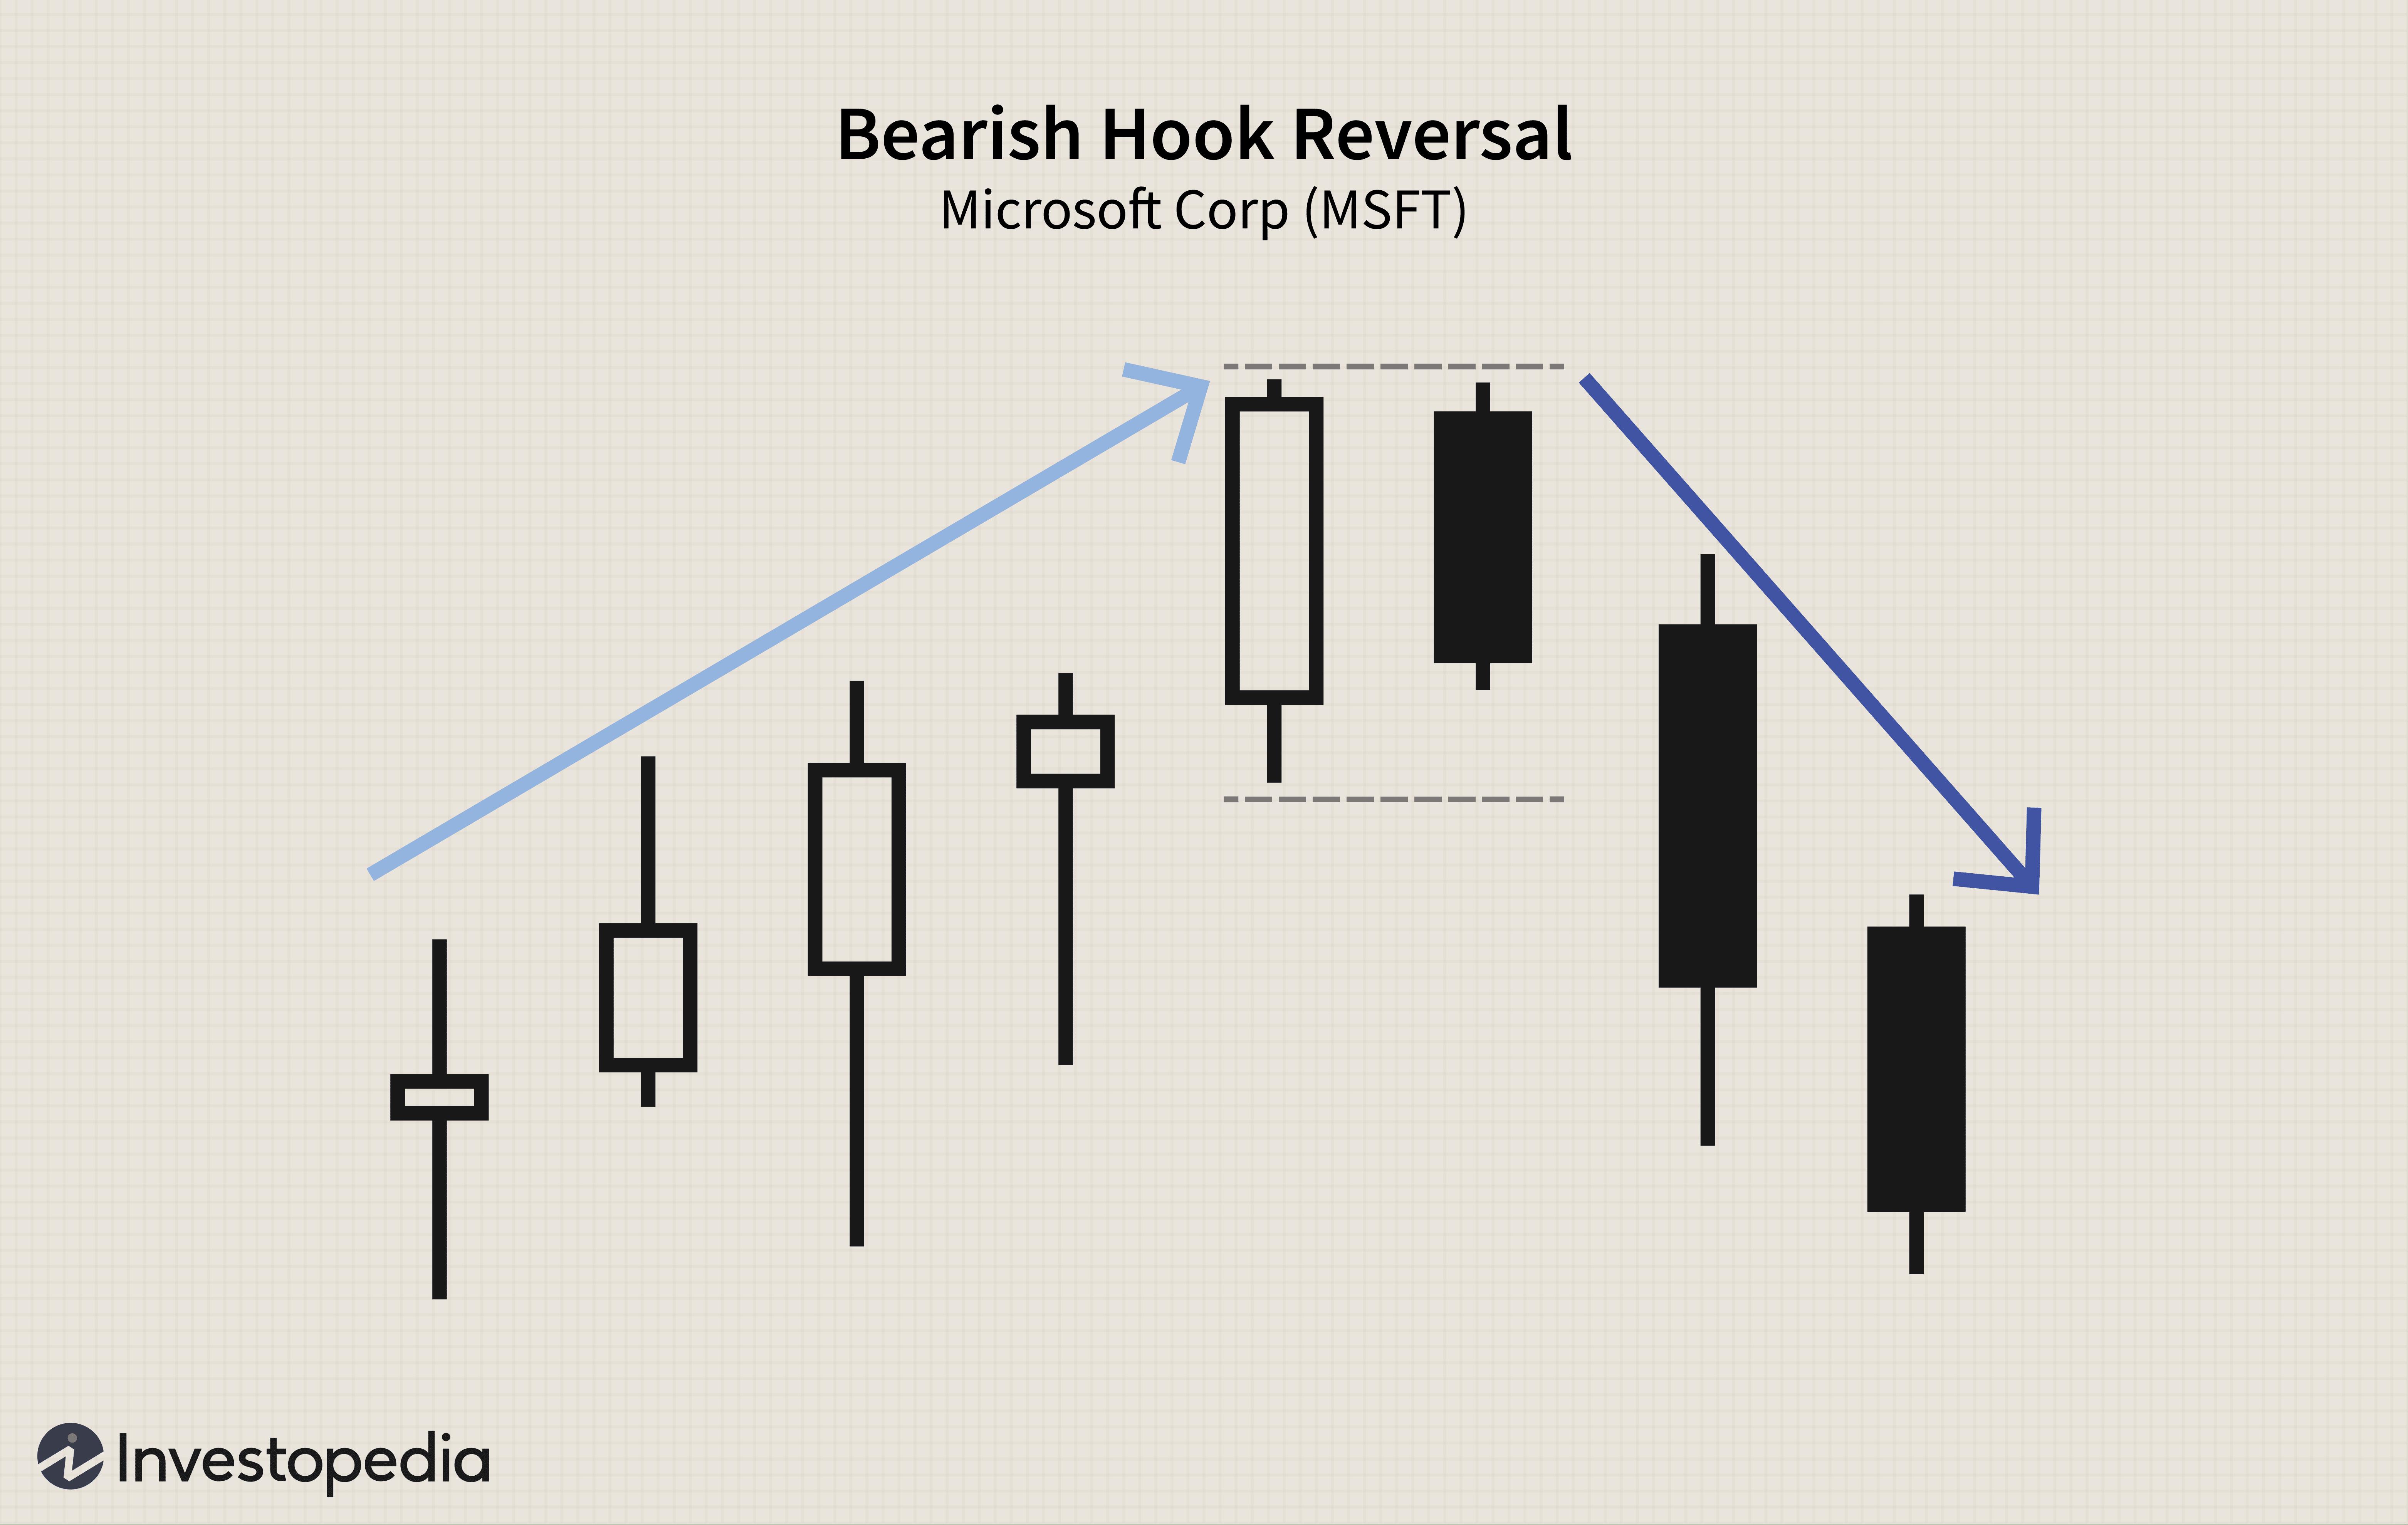 Bearish Hook Reversal